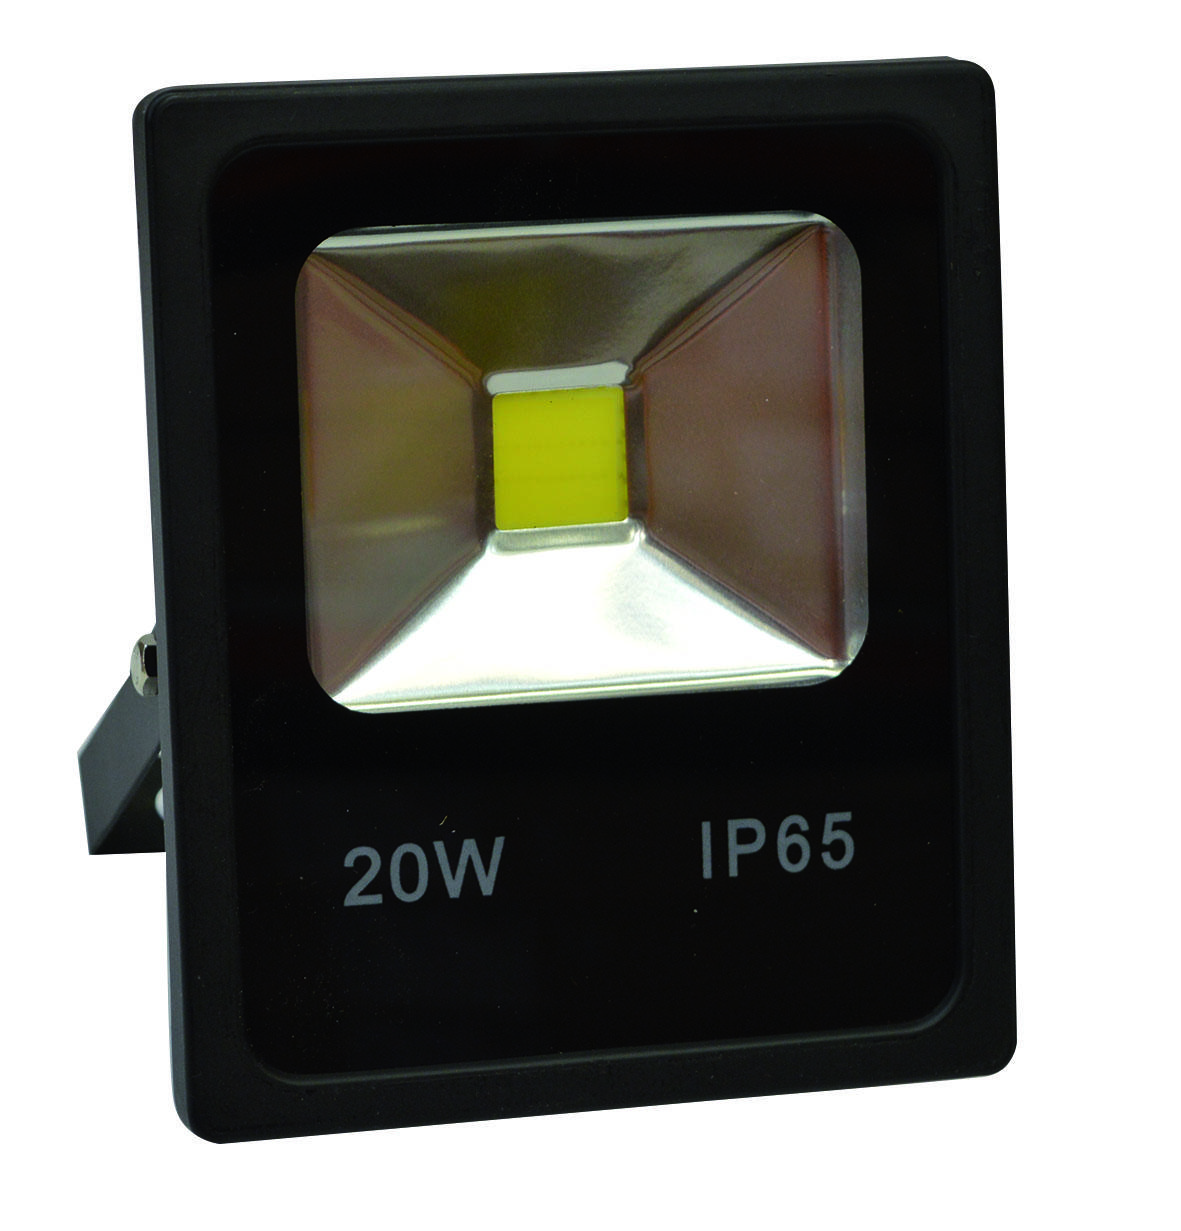 PROIETTORE LED BIANCO CALDO 6000K 20W NERO IP65 - GIGRA LINE FLB20/860